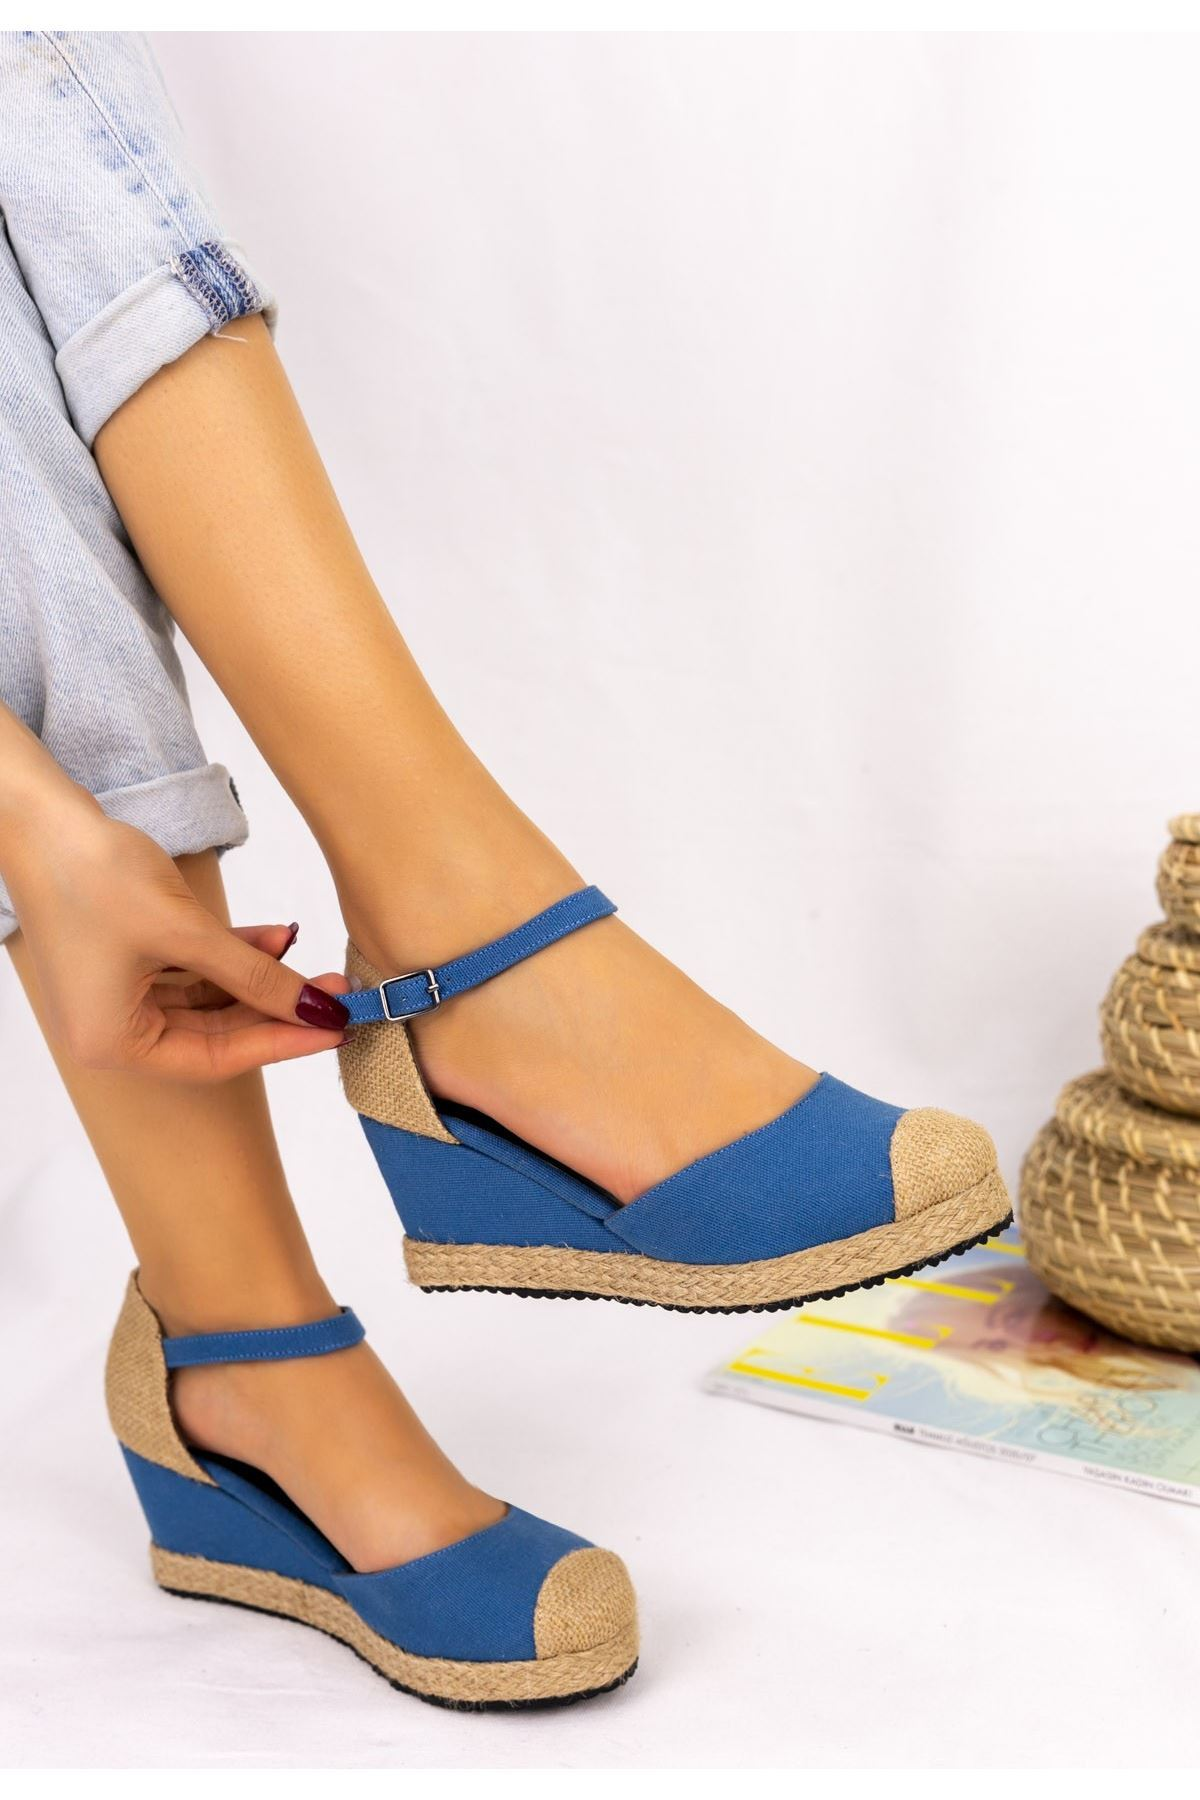 Neyma Bebe Mavisi Dolgu Topuk Sandalet